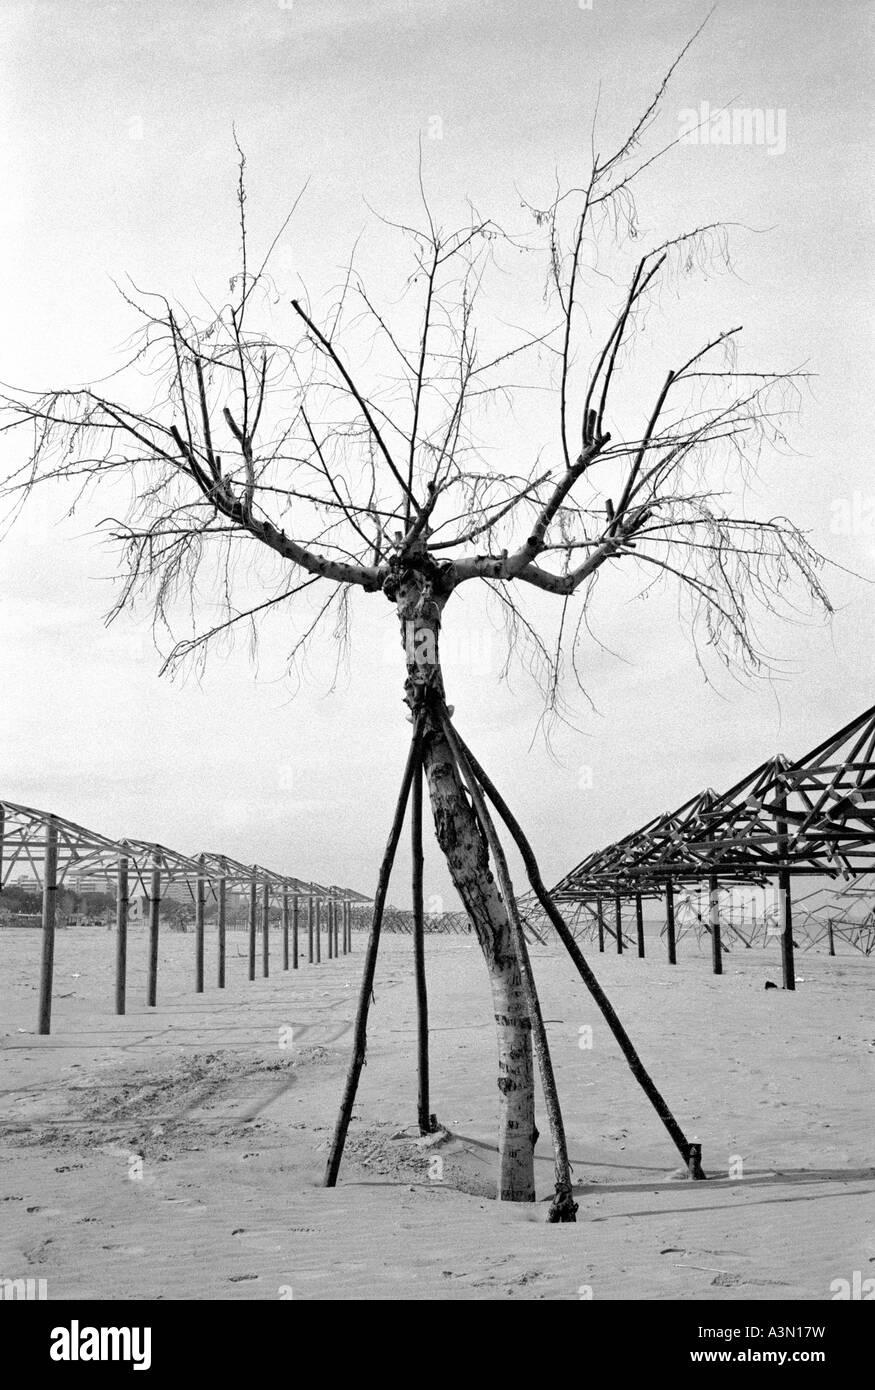 Italy. A tree on the beach - Stock Image